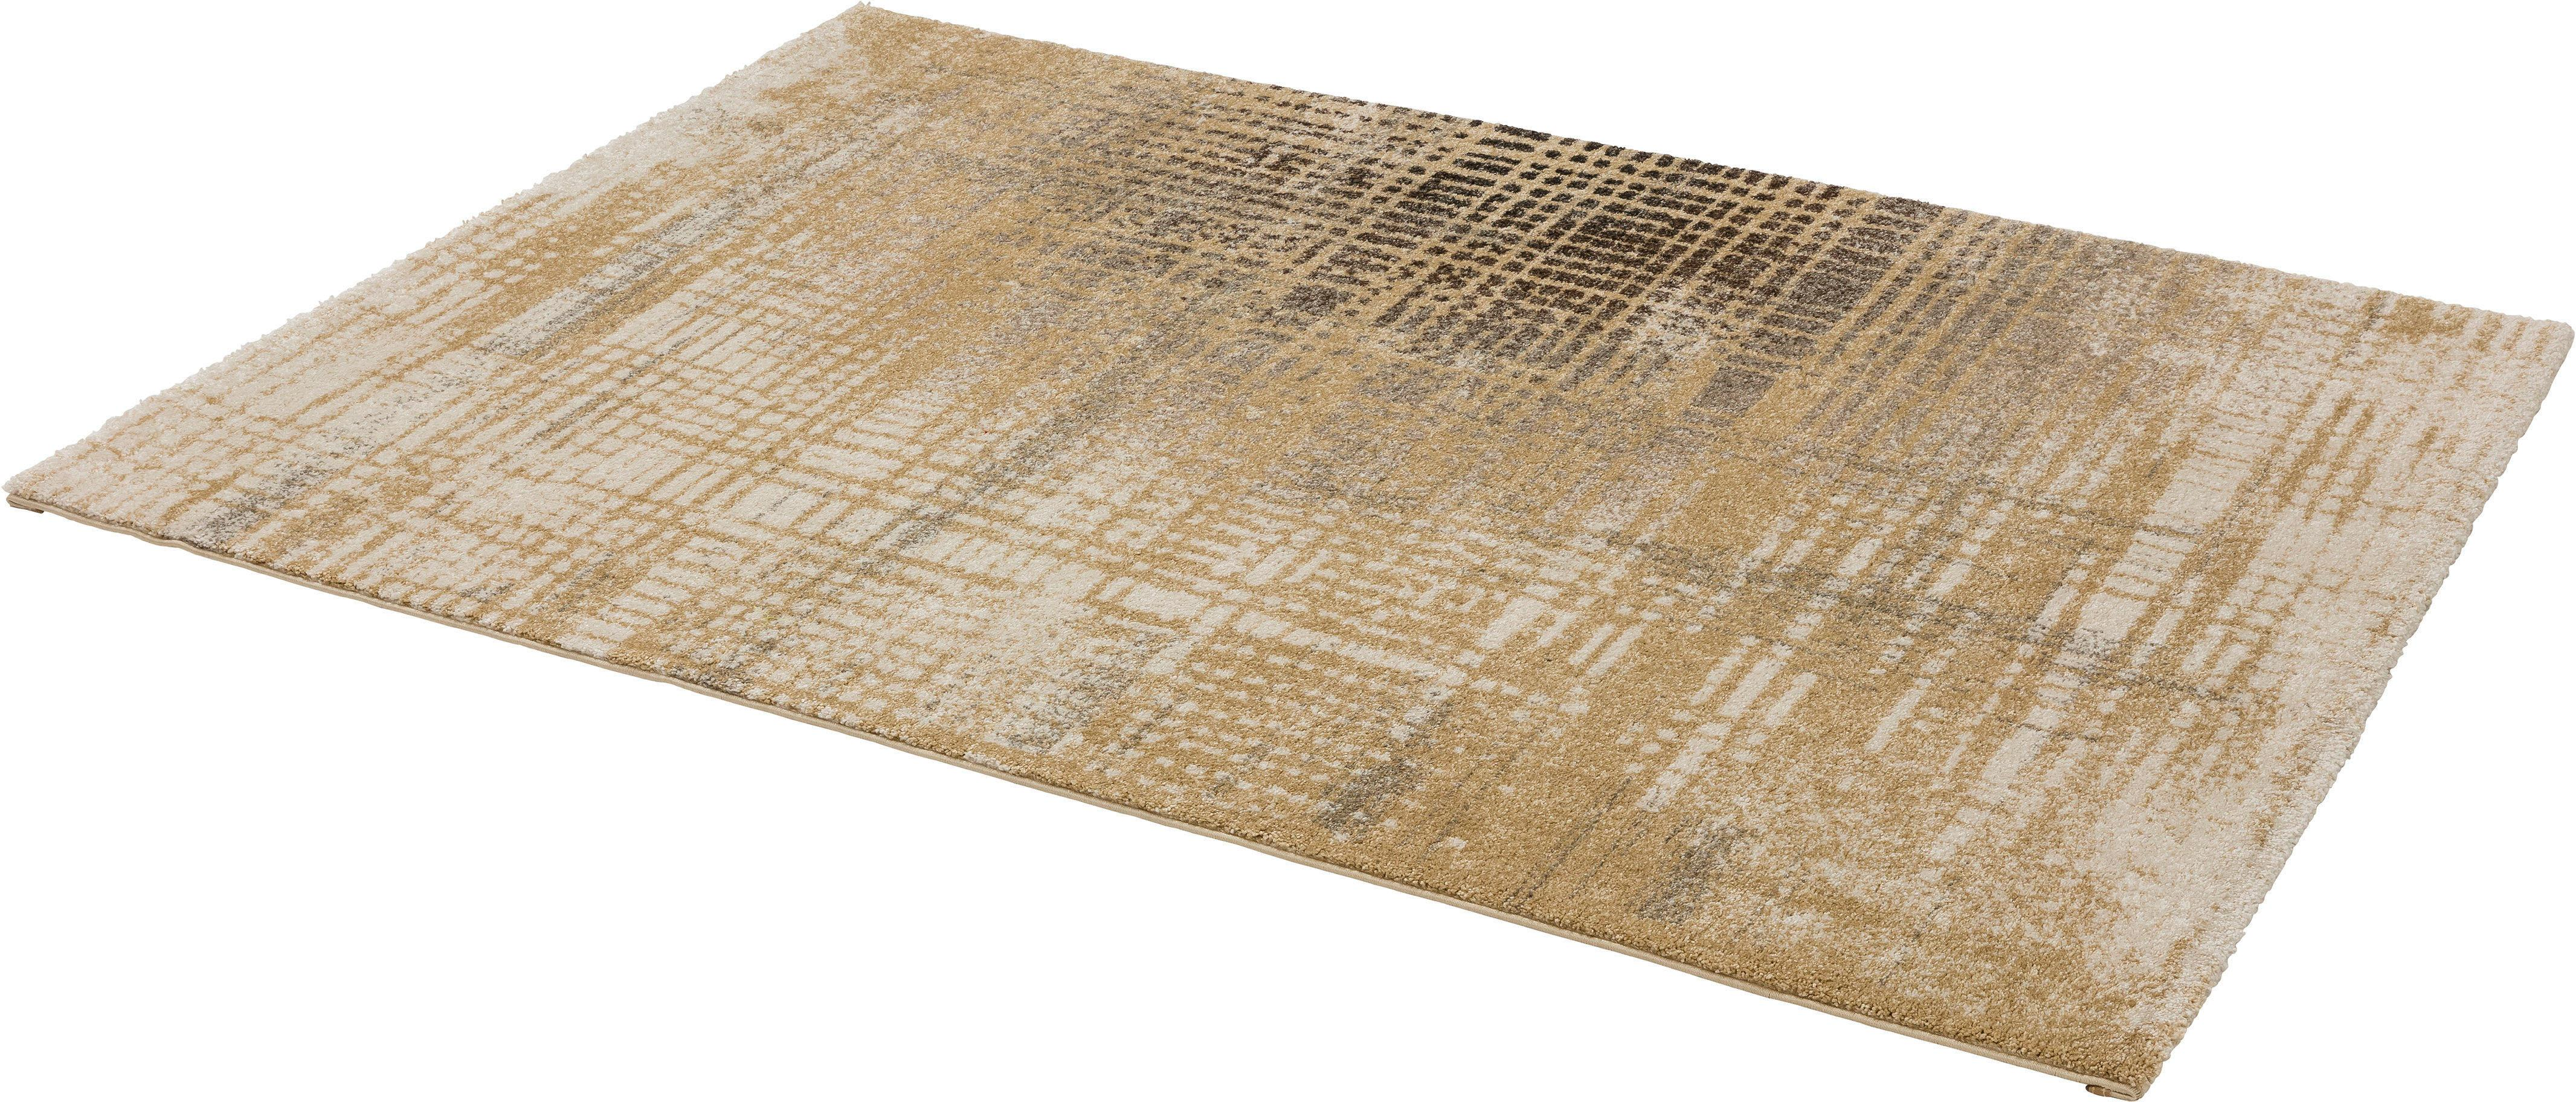 Teppich Ravello 173 ASTRA rechteckig Höhe 20 mm maschinell gewebt